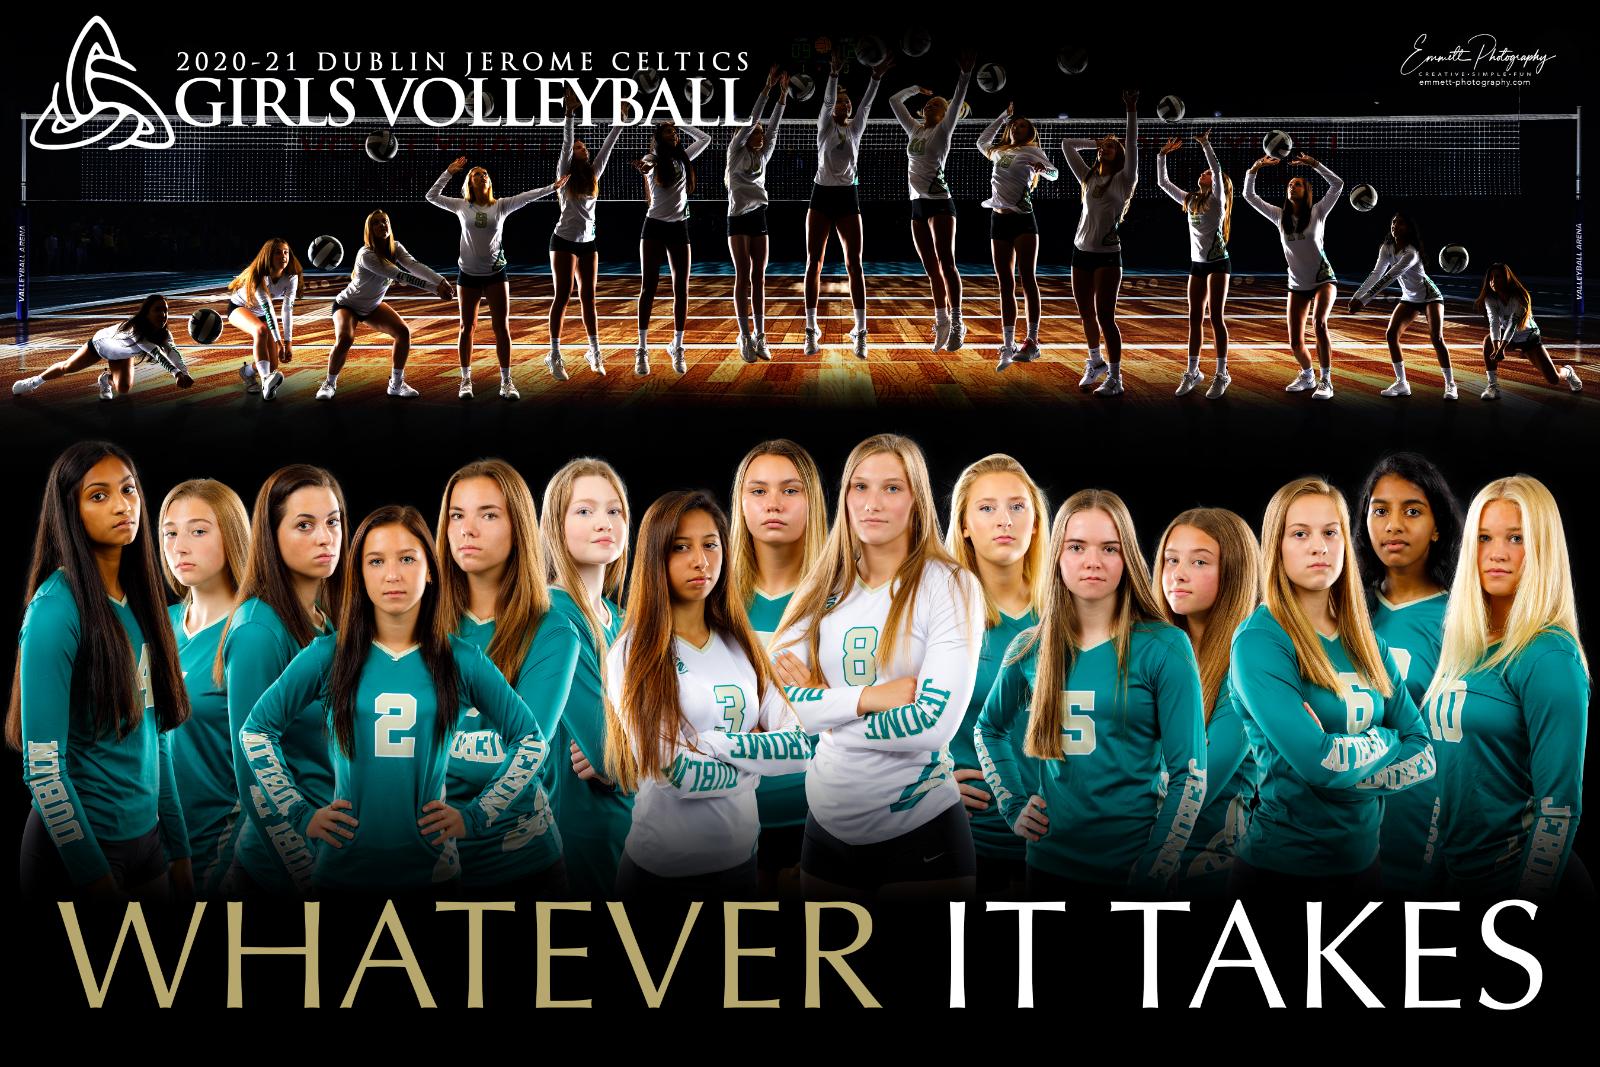 2020-2021 Girls Volleyball Team Poster